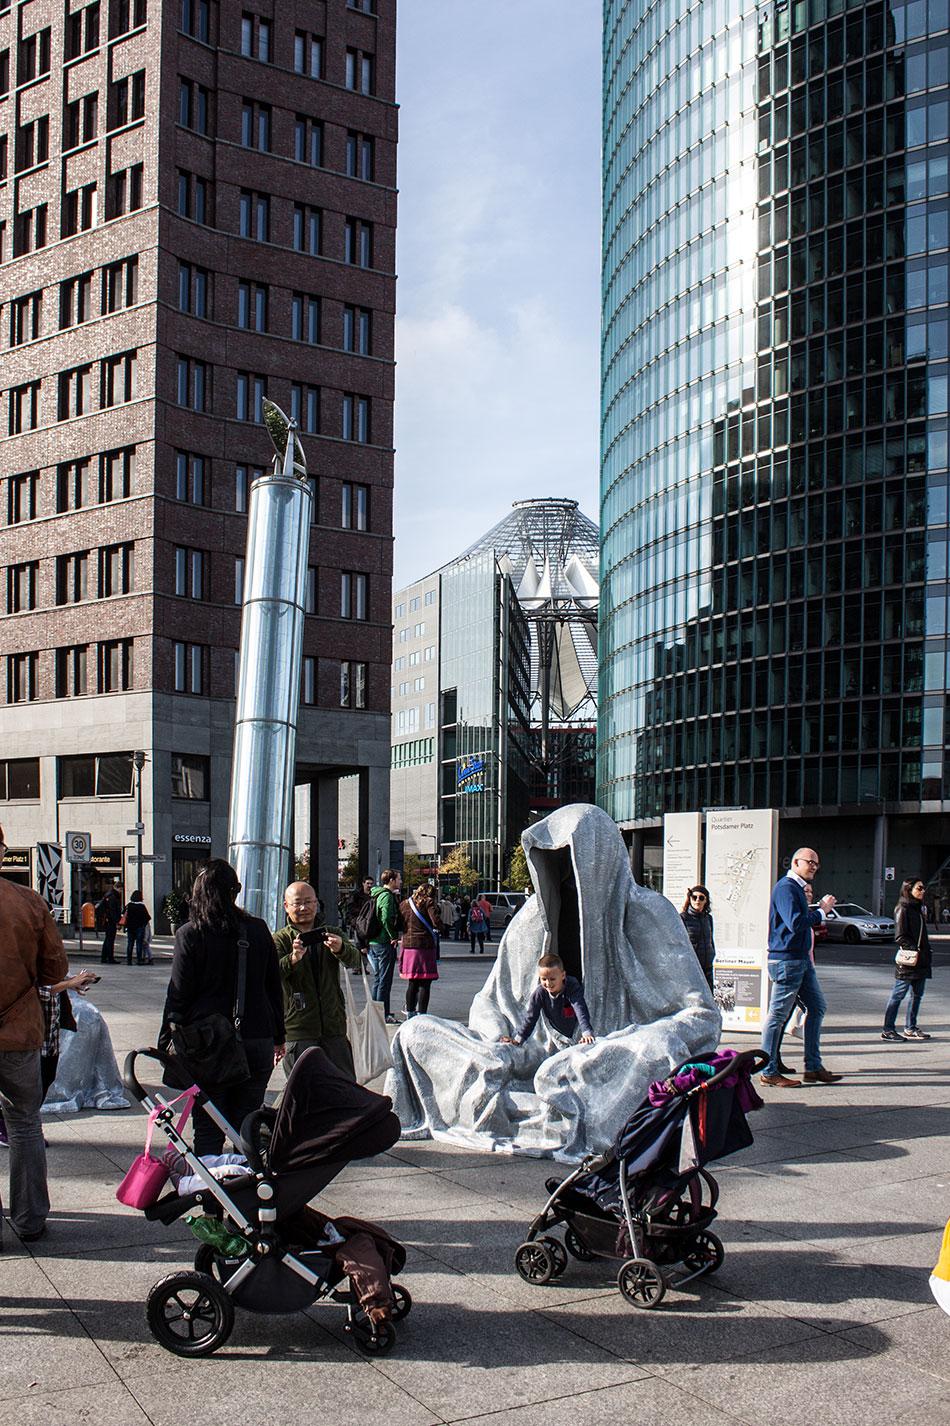 festival-of-lights-berlin-potzdamer-platz-light-art-show-exhibition-lumina-guardians-of-time-manfred-kili-kielnhofer-contemporary-arts-design-sculpture-3095